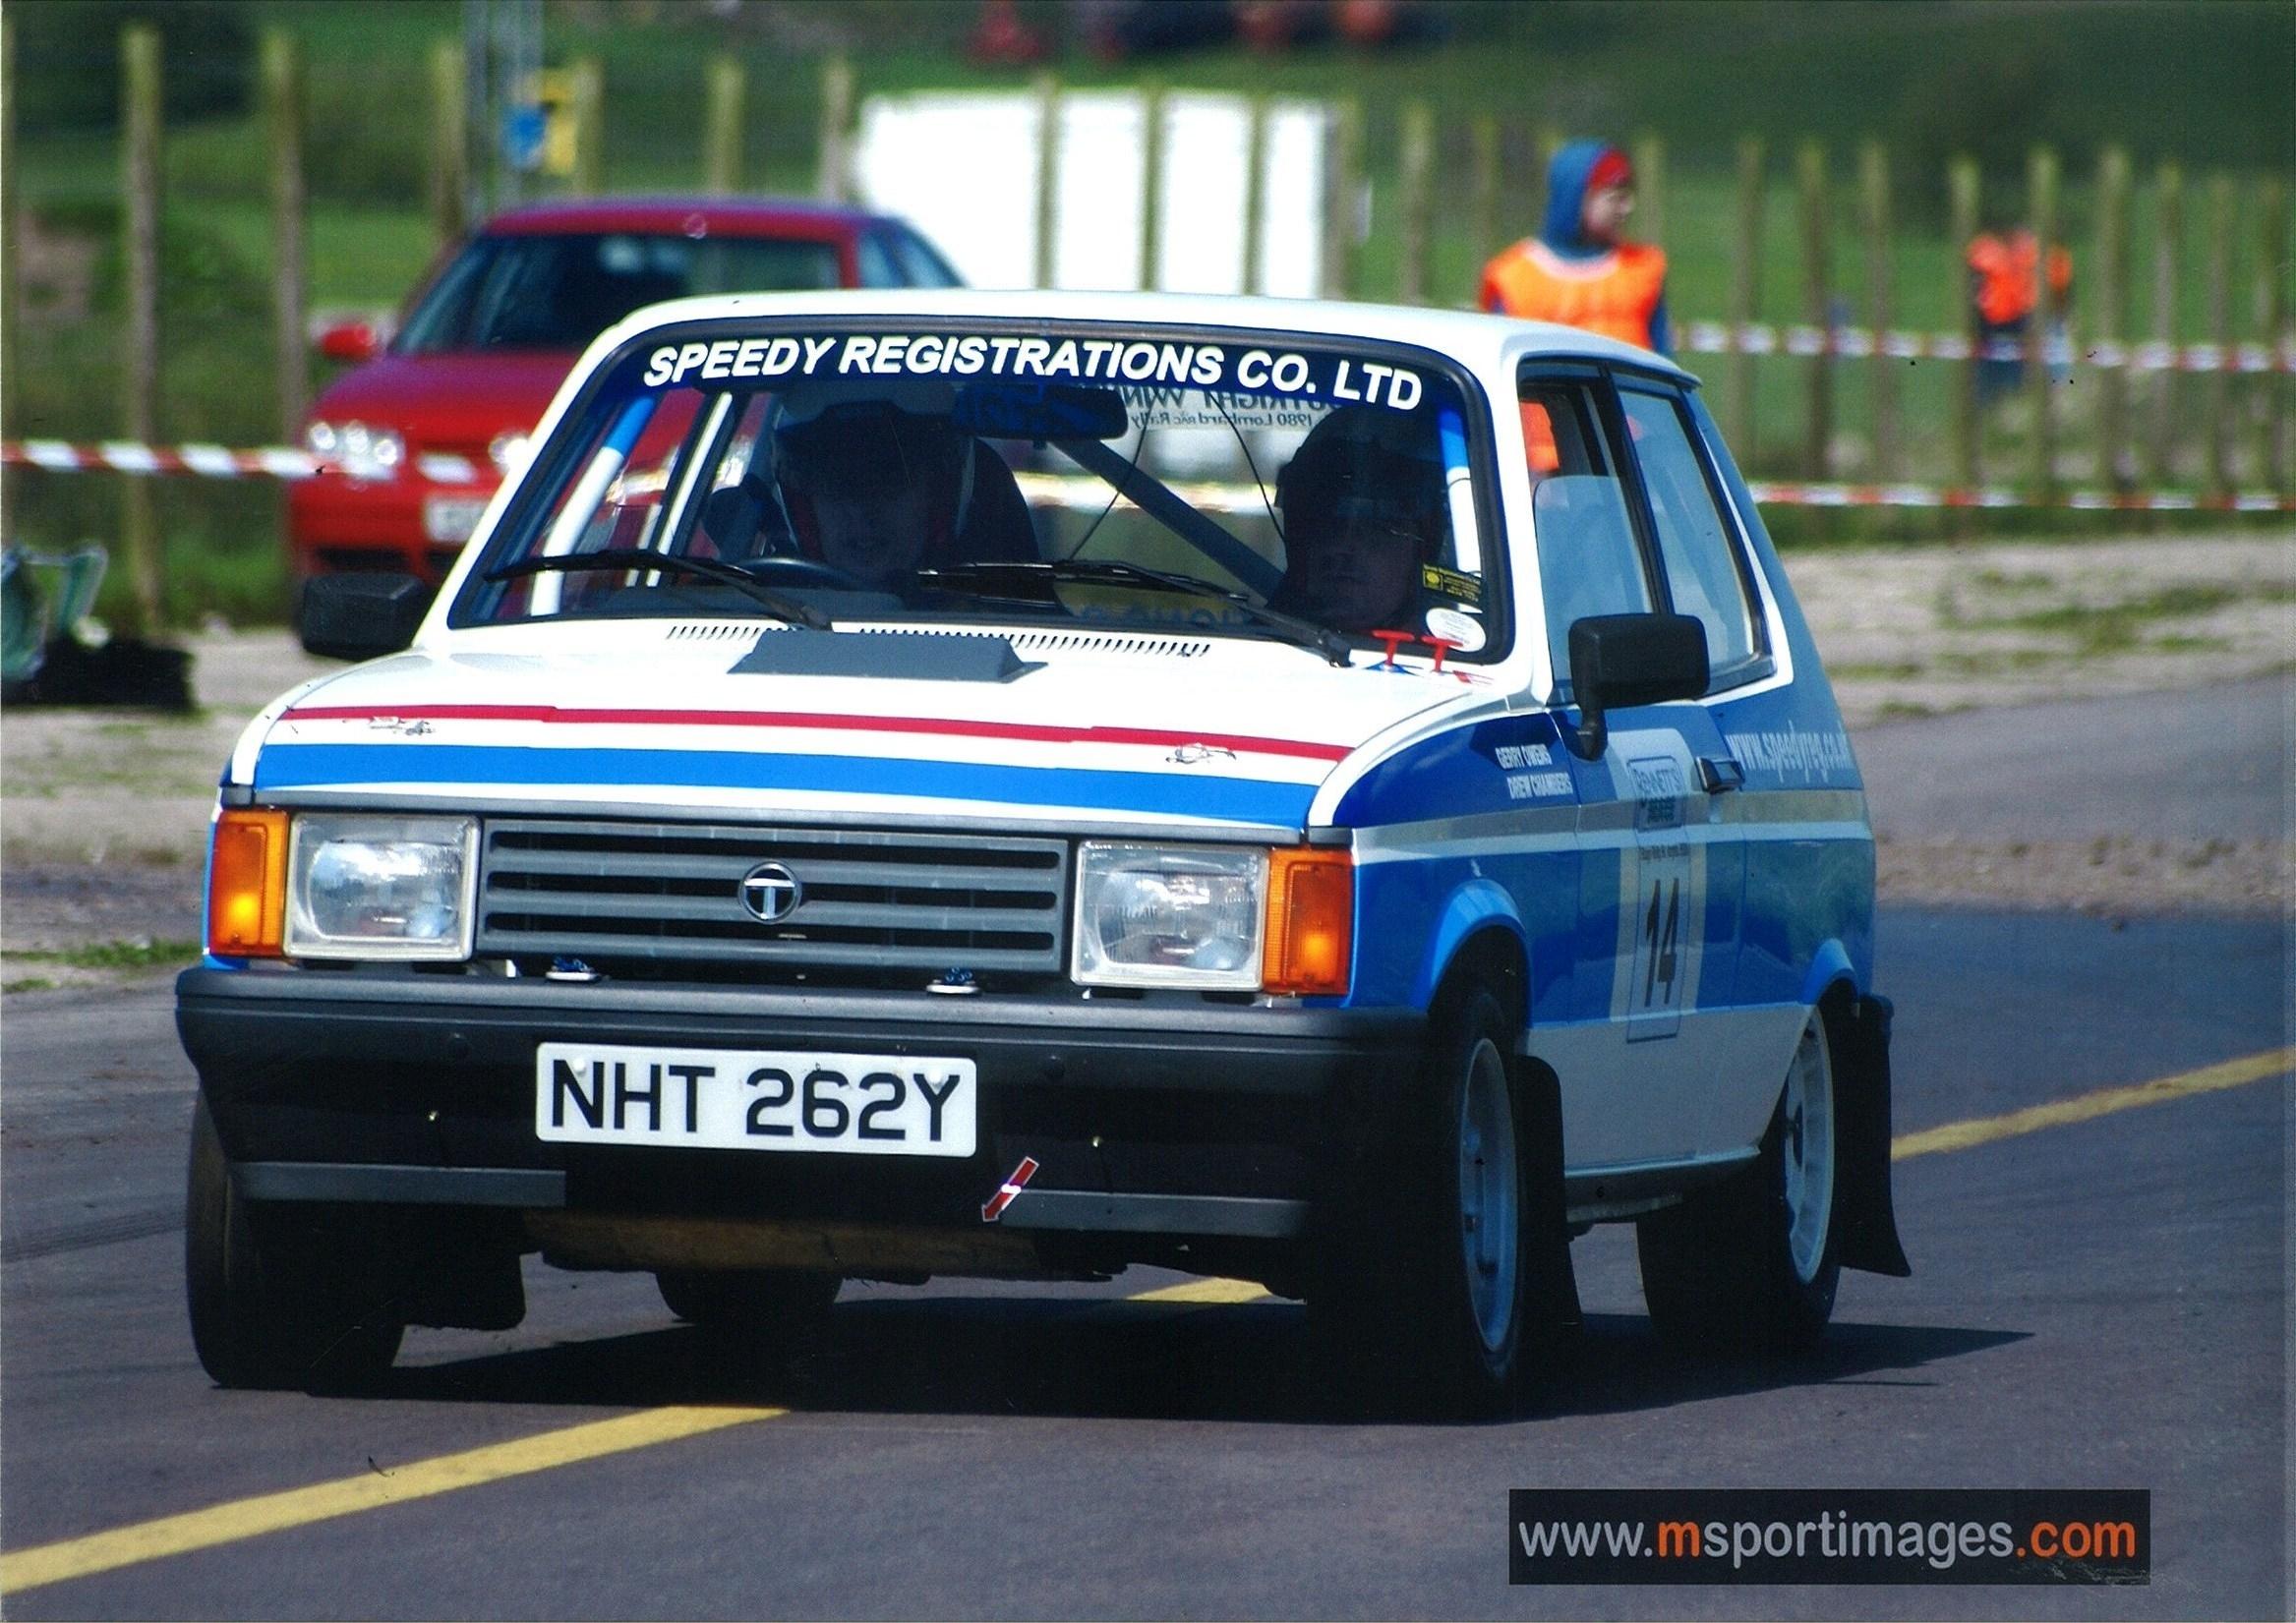 drew-rally-car1a